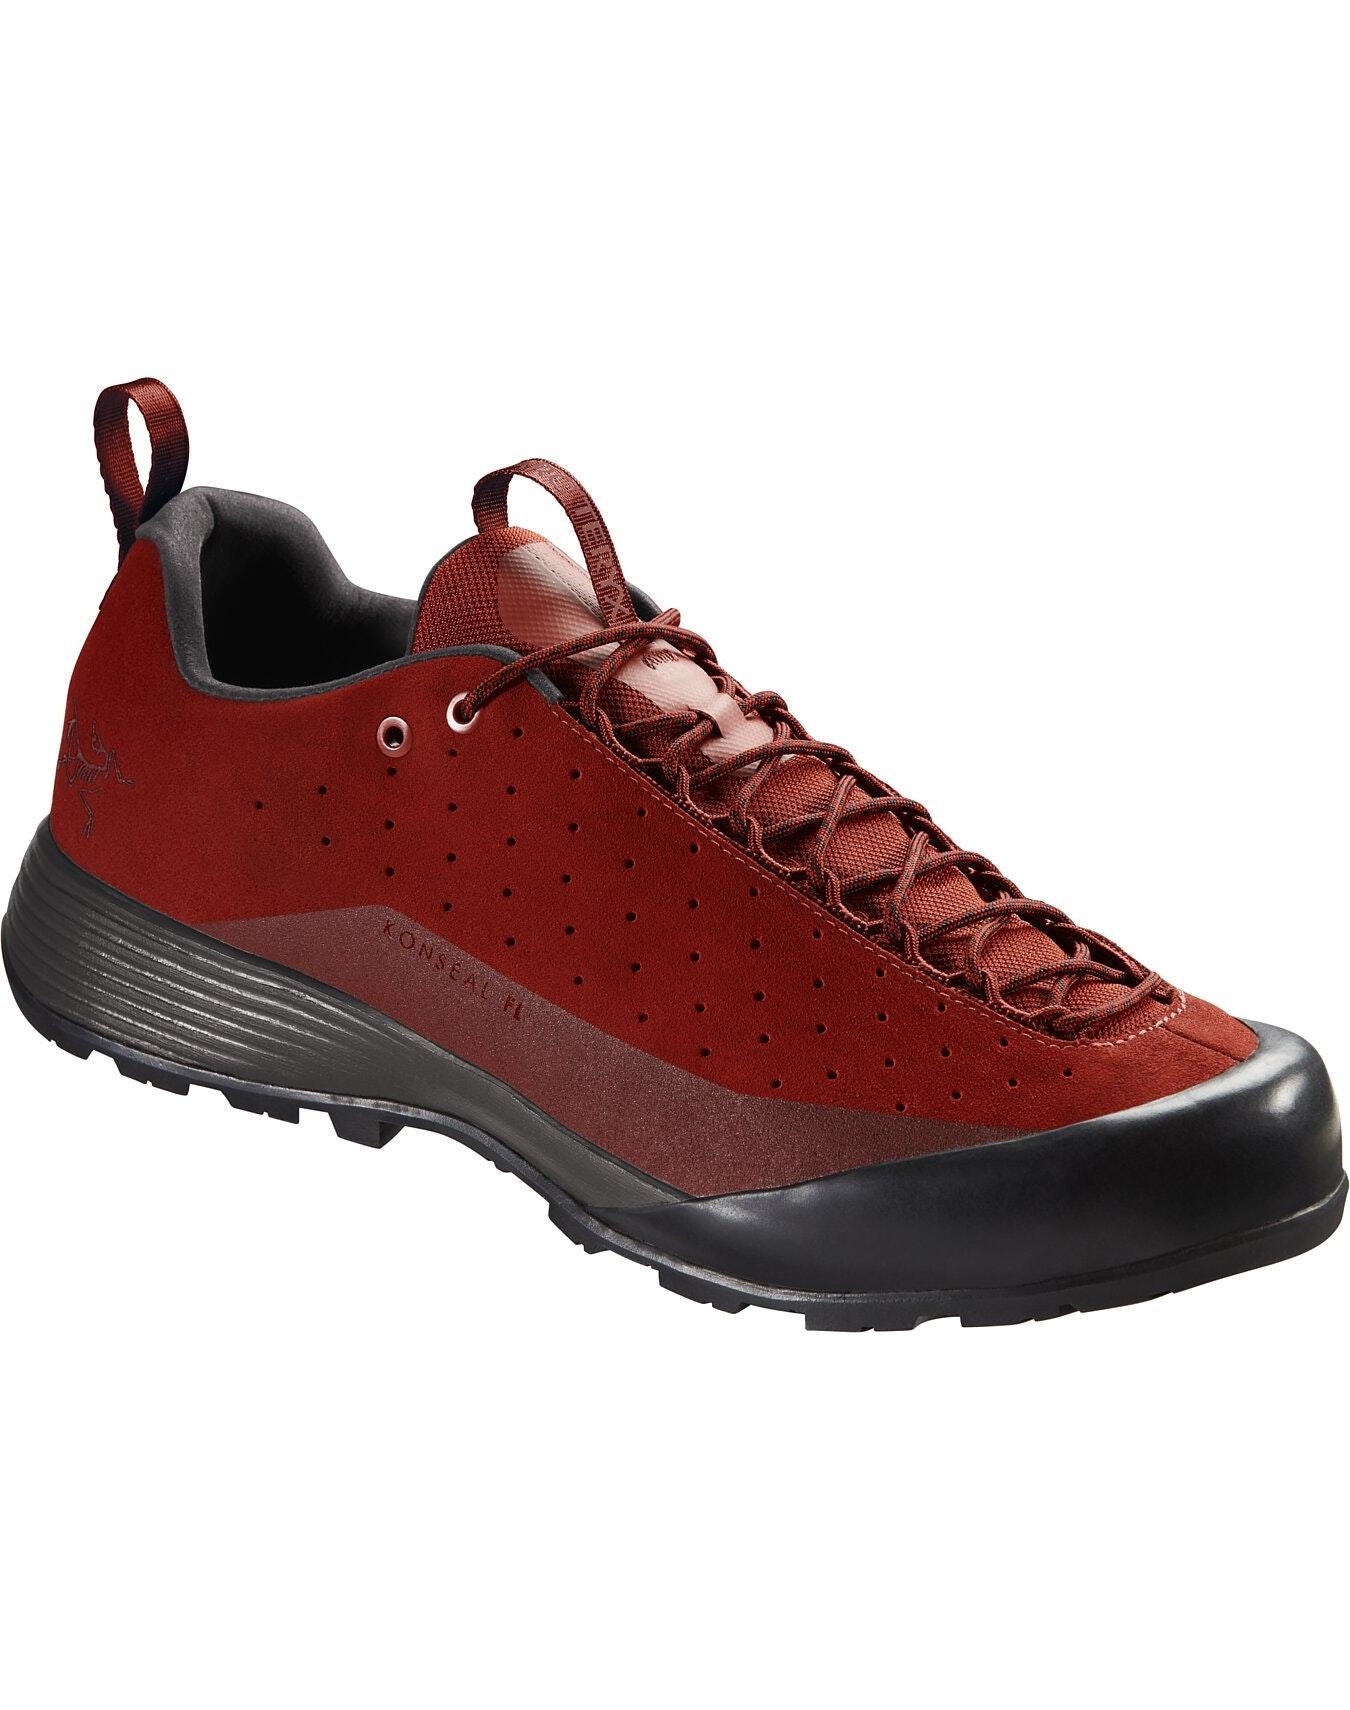 Konseal FL 2 Leather Shoe Infrared/Carbon Copy